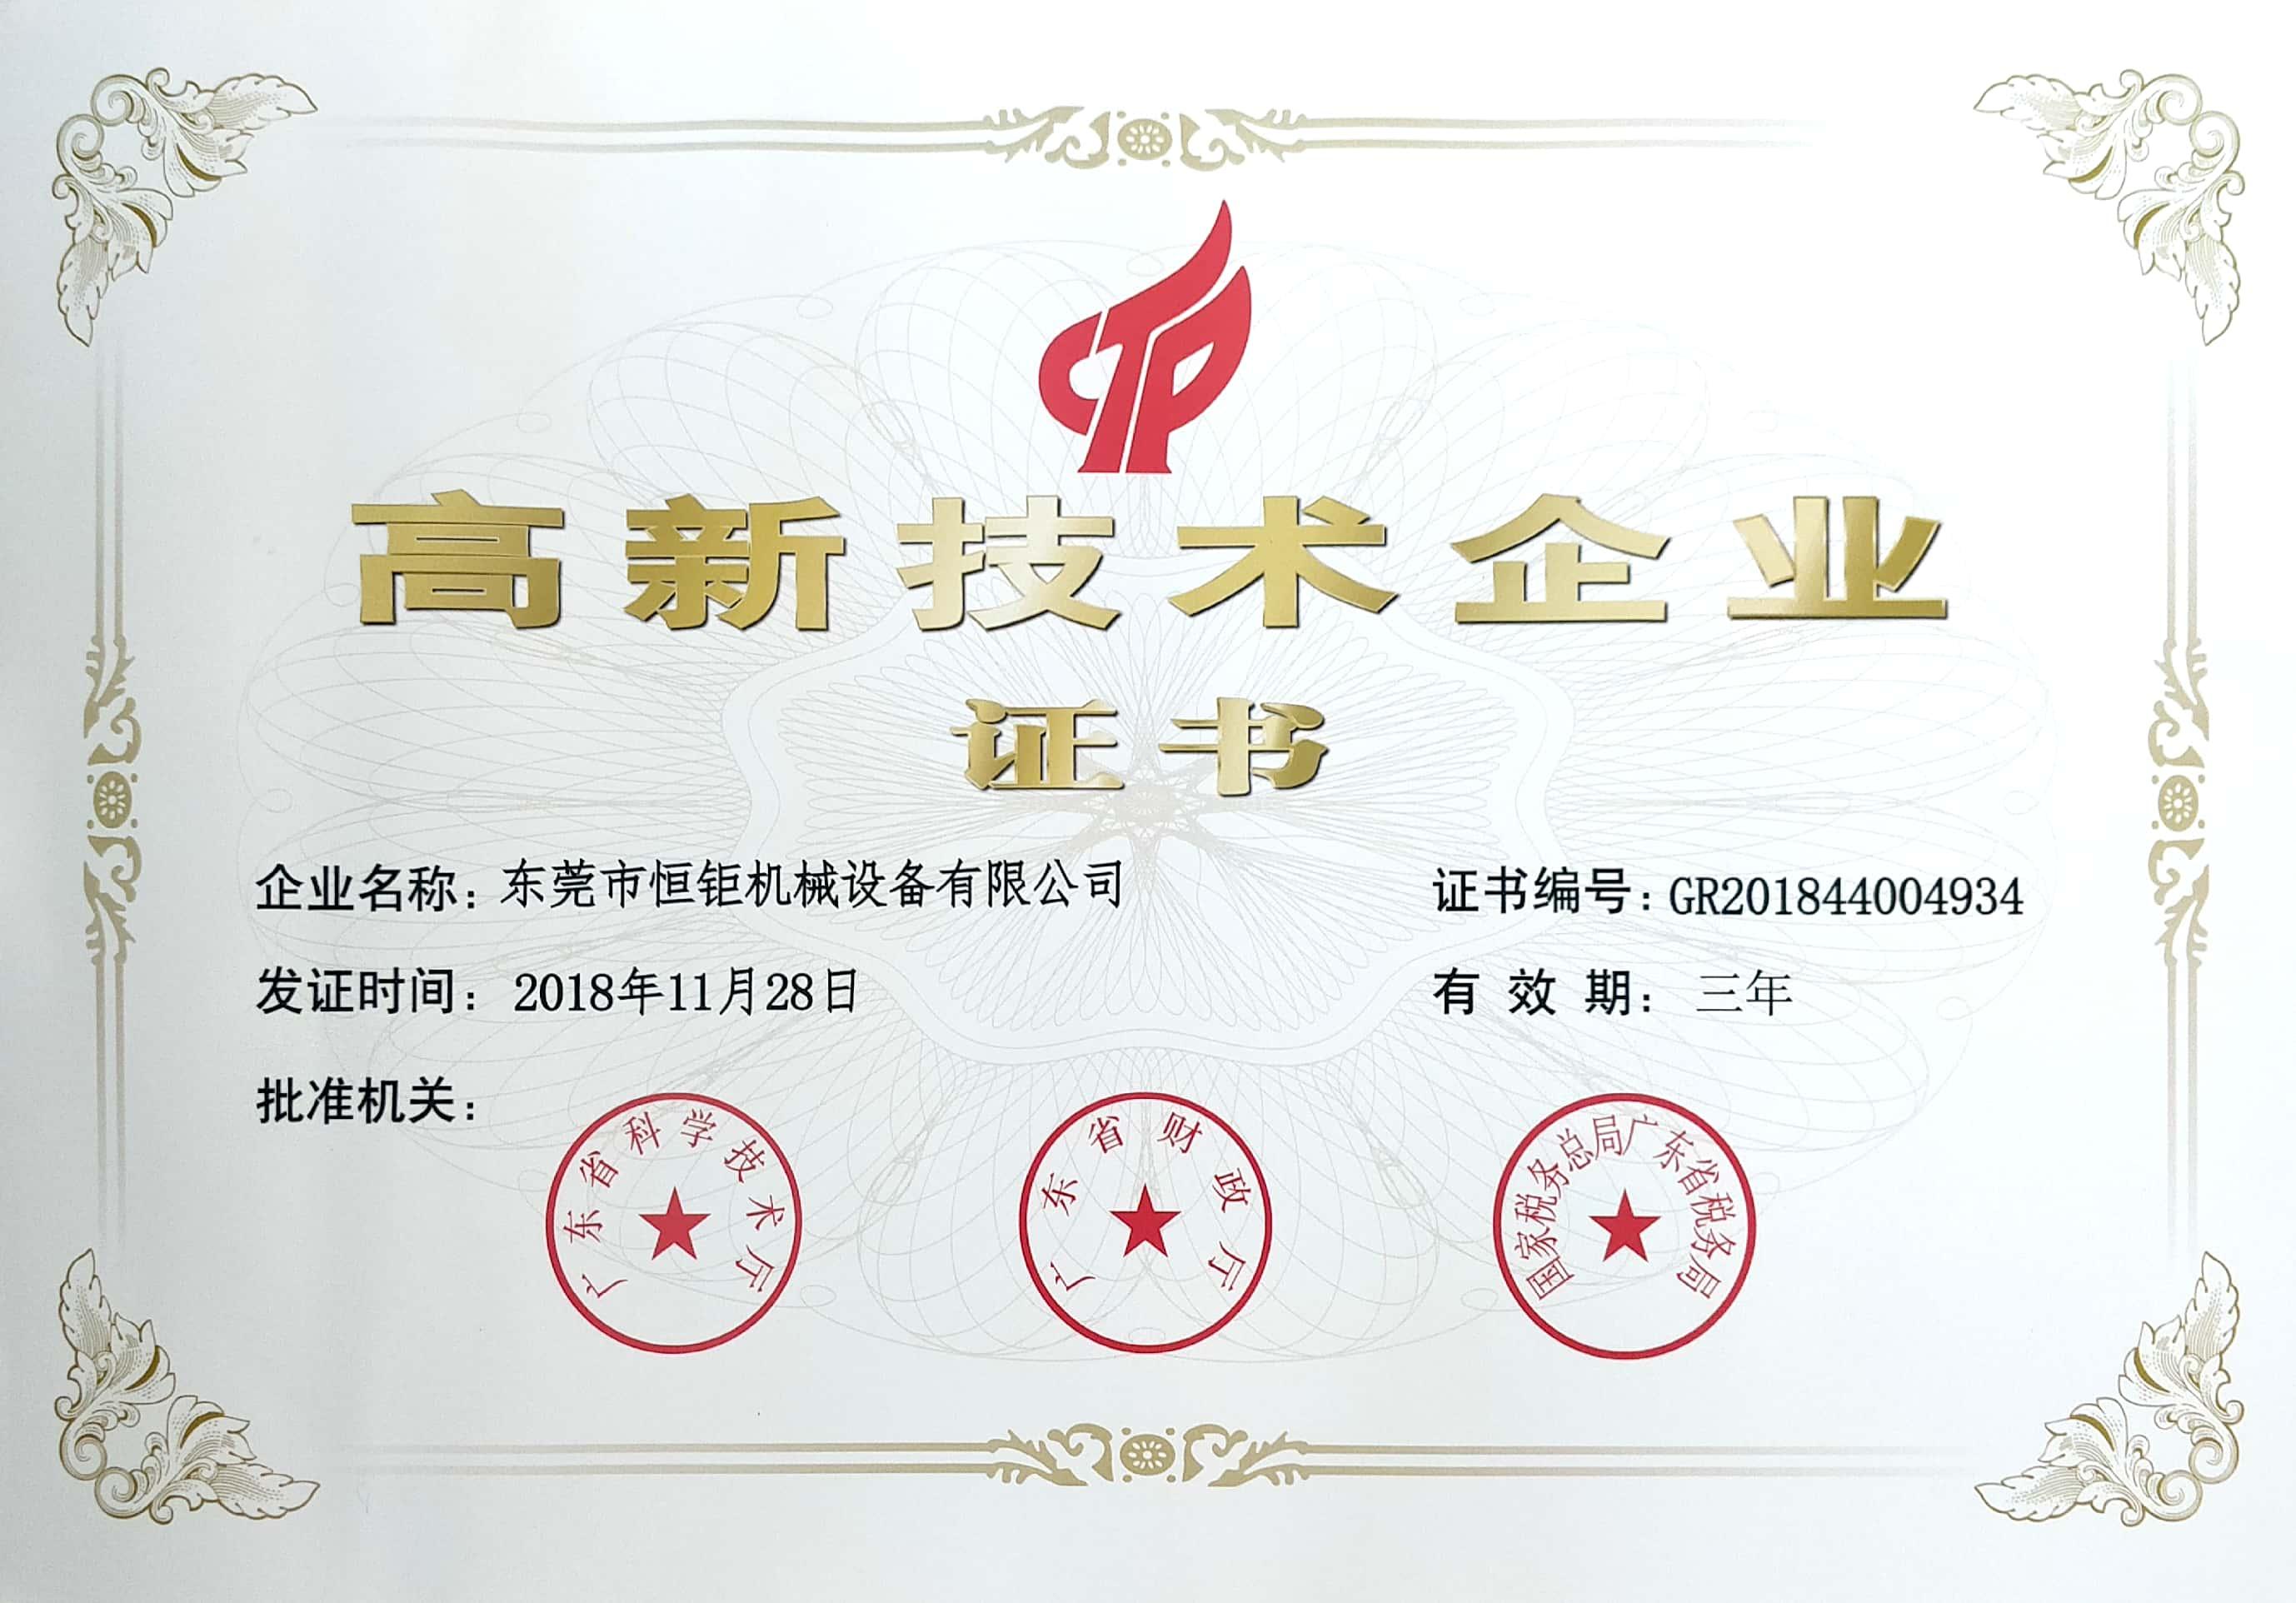 Hengju-Gravimetric Dosing Systems, Dongguan Hengju Machinery Equipment Co, Ltd-1